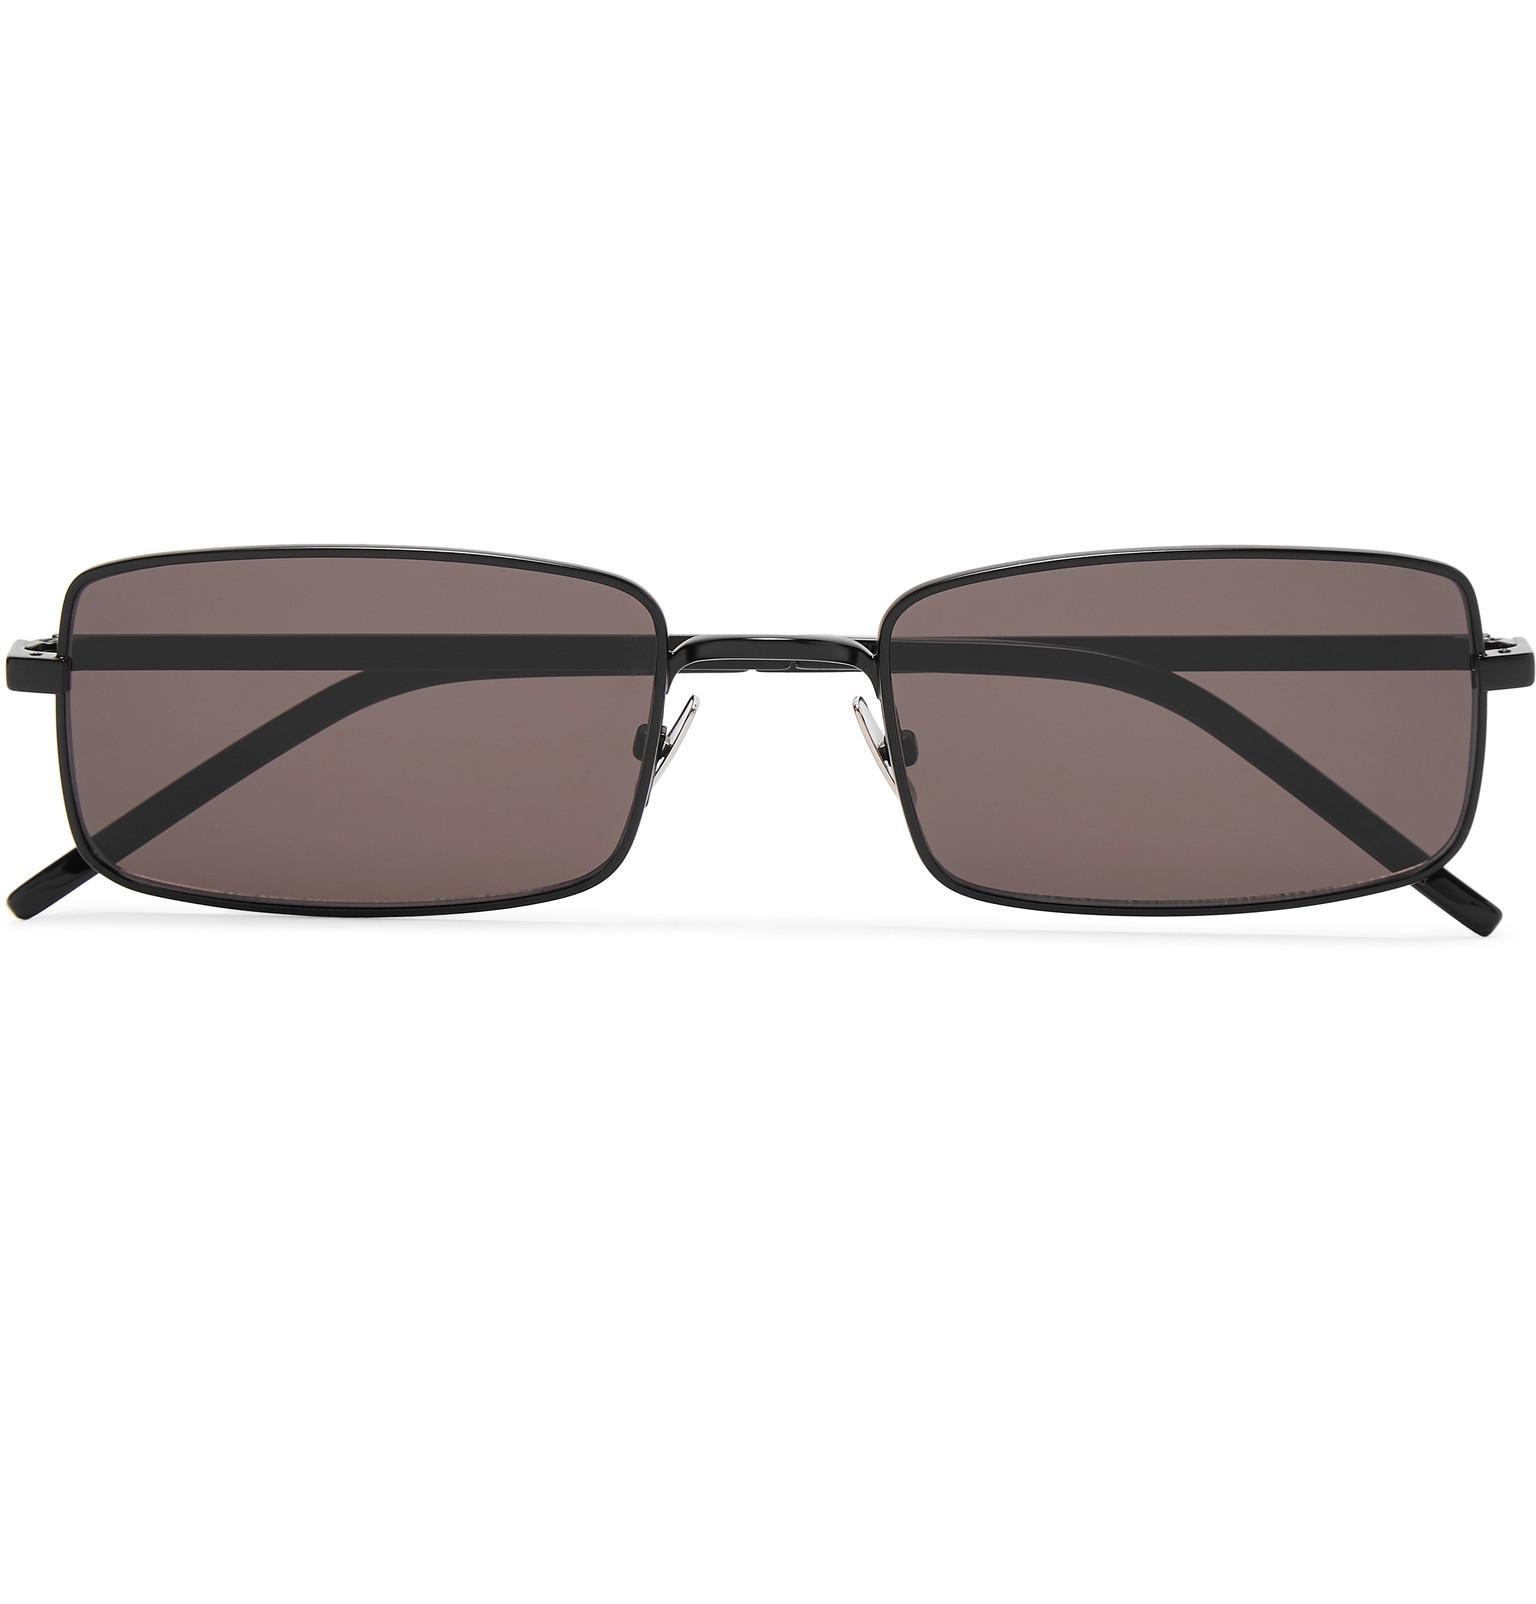 d09b9c486d1c Saint Laurent Square-frame Matte-metal Sunglasses in Black for Men ...